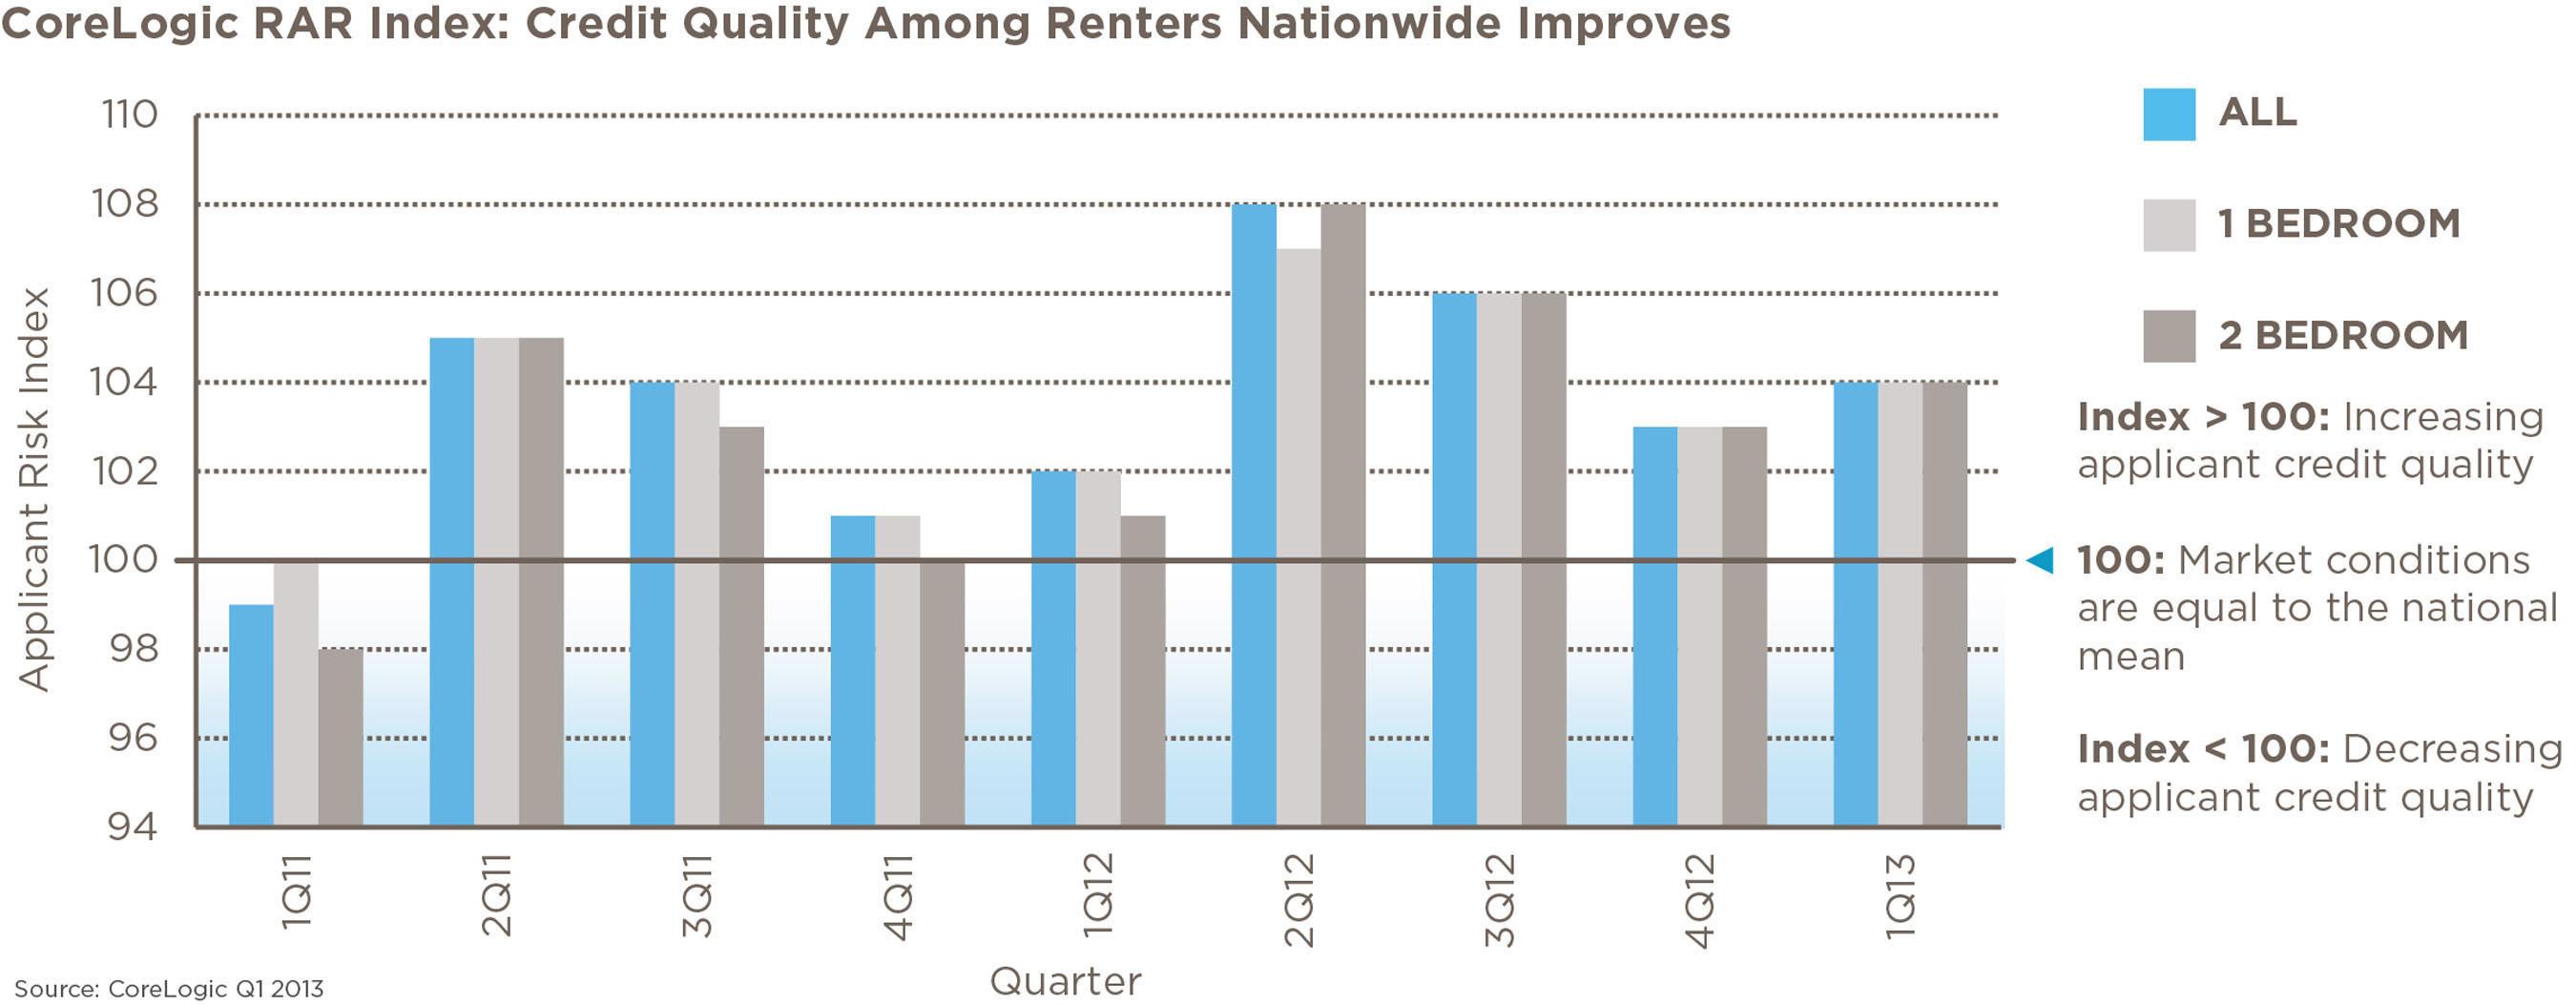 CoreLogic Releases First Quarter 2013 Renter Applicant Risk Index Report